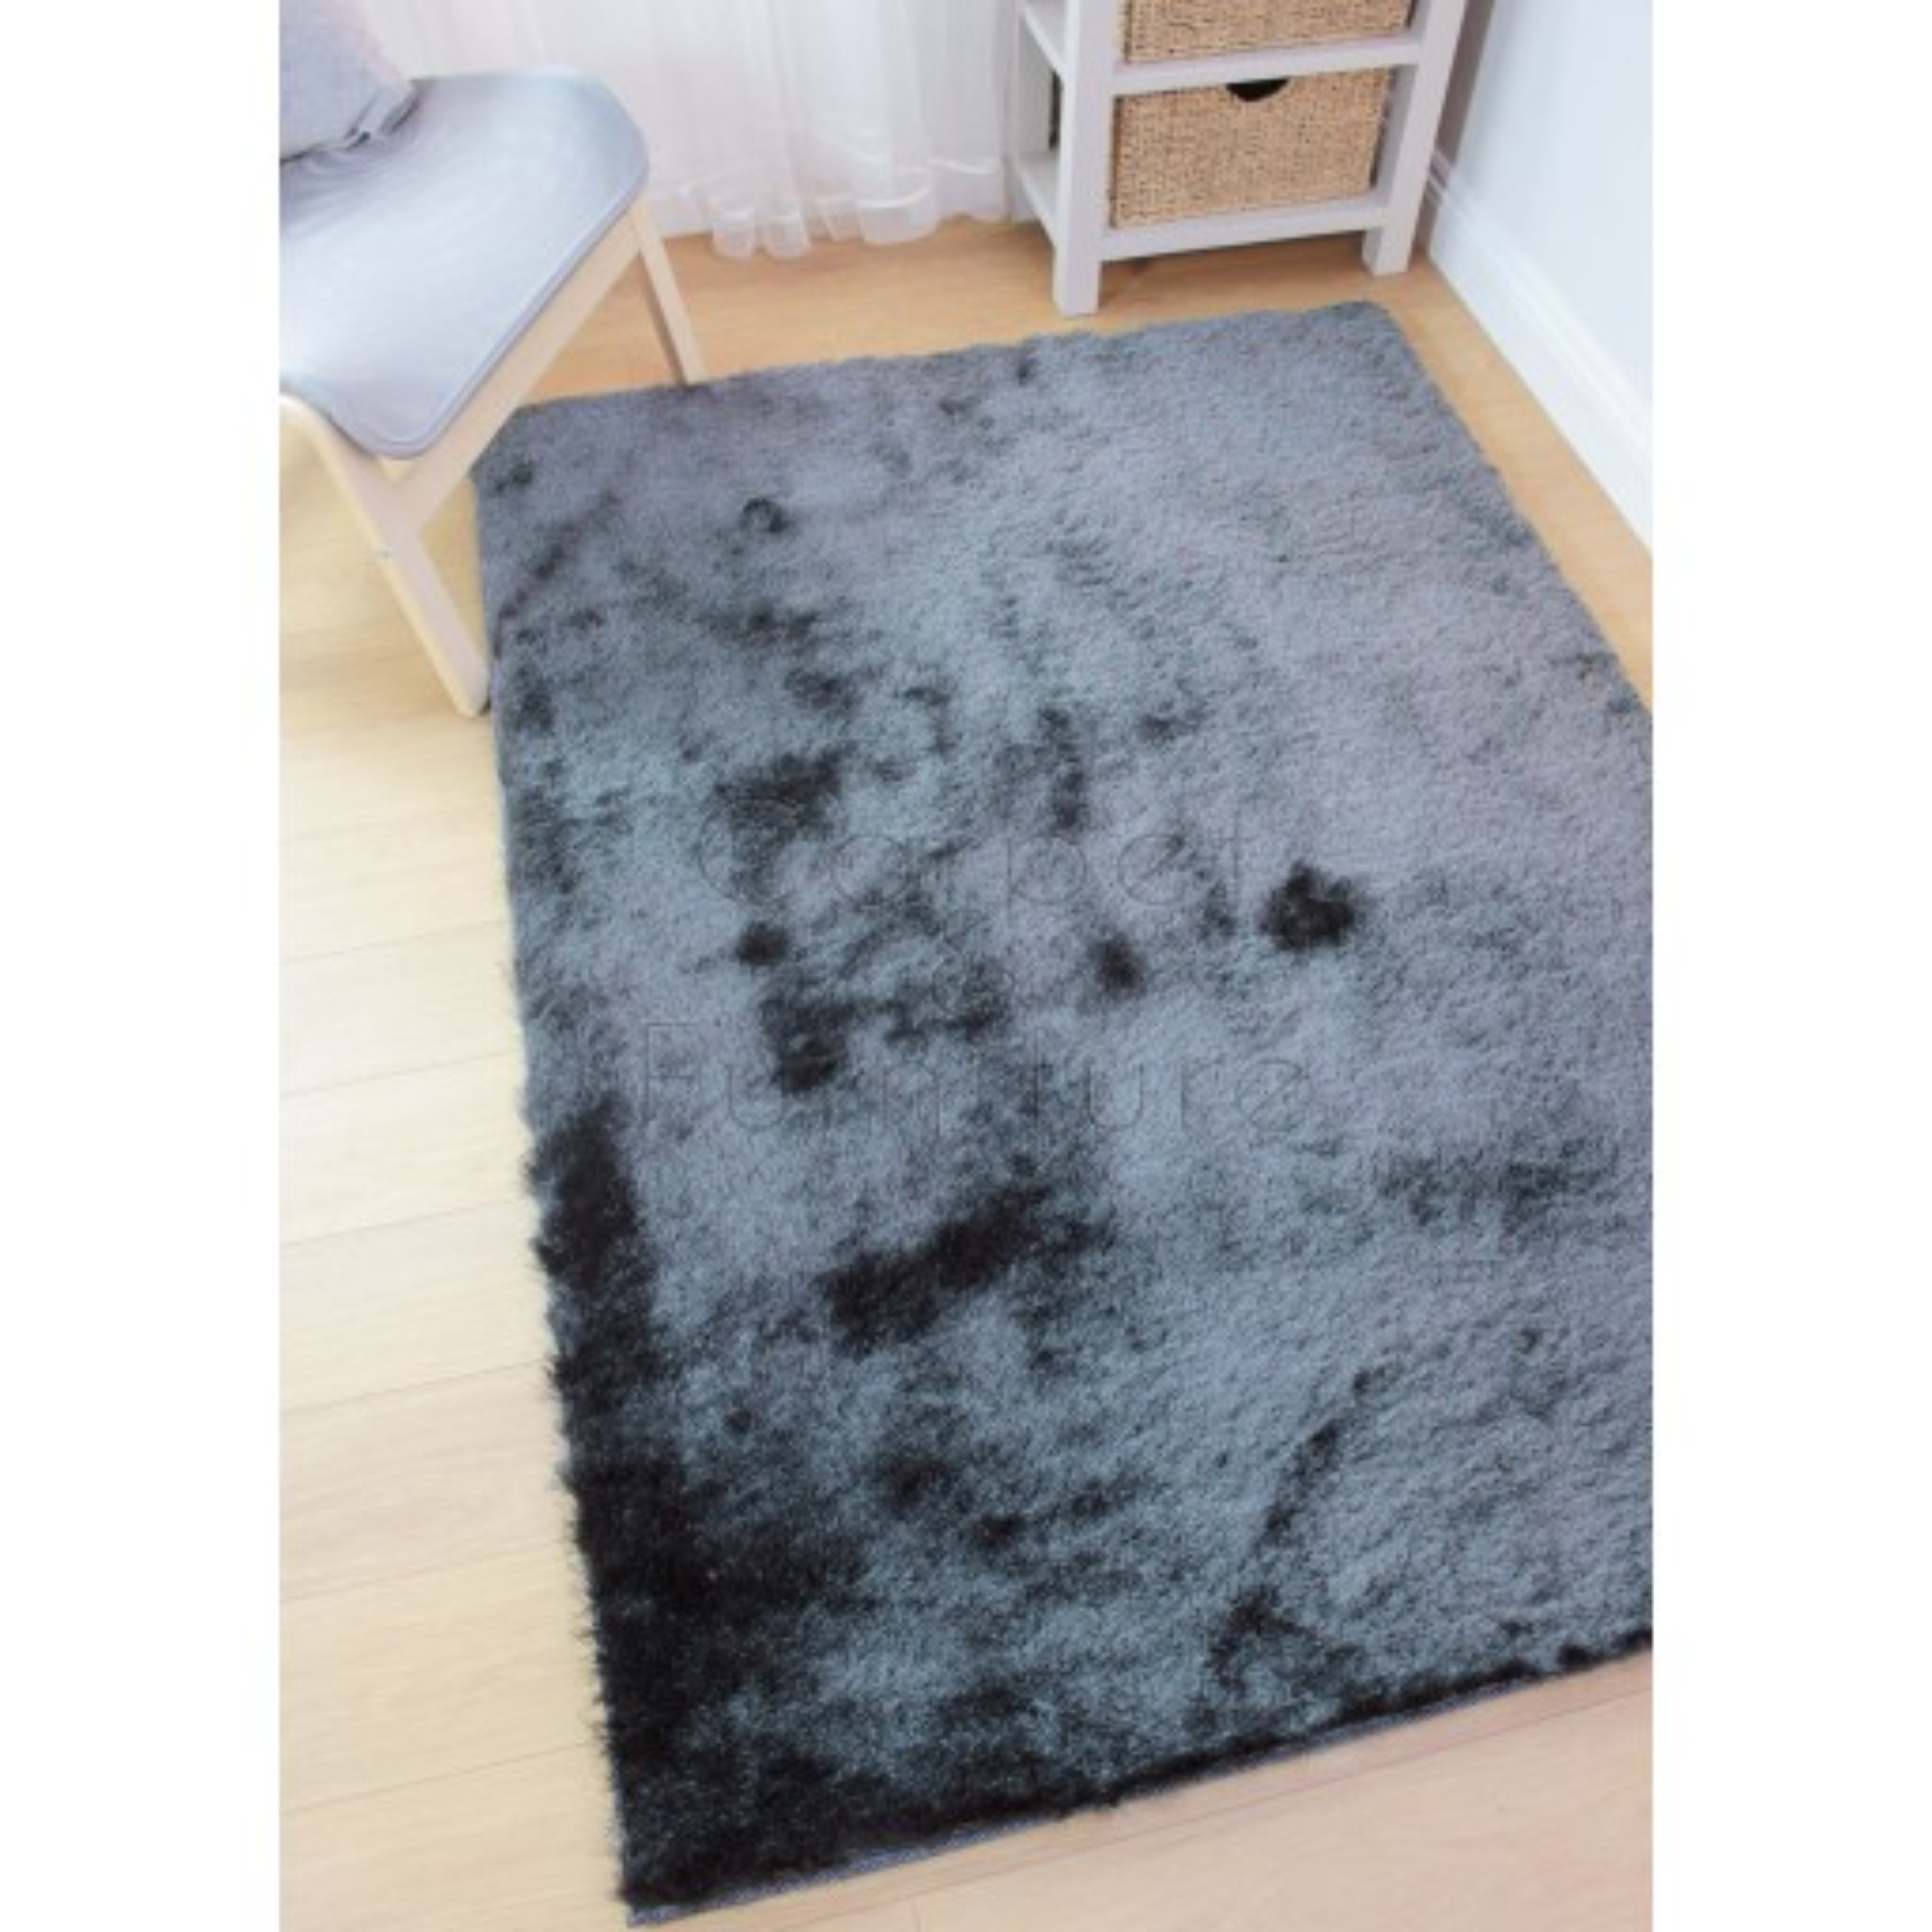 "Splendour Shadow Shaggy Rug - Charcoal - Size 160 x 220 cm (5'3"" x 7'3"")"